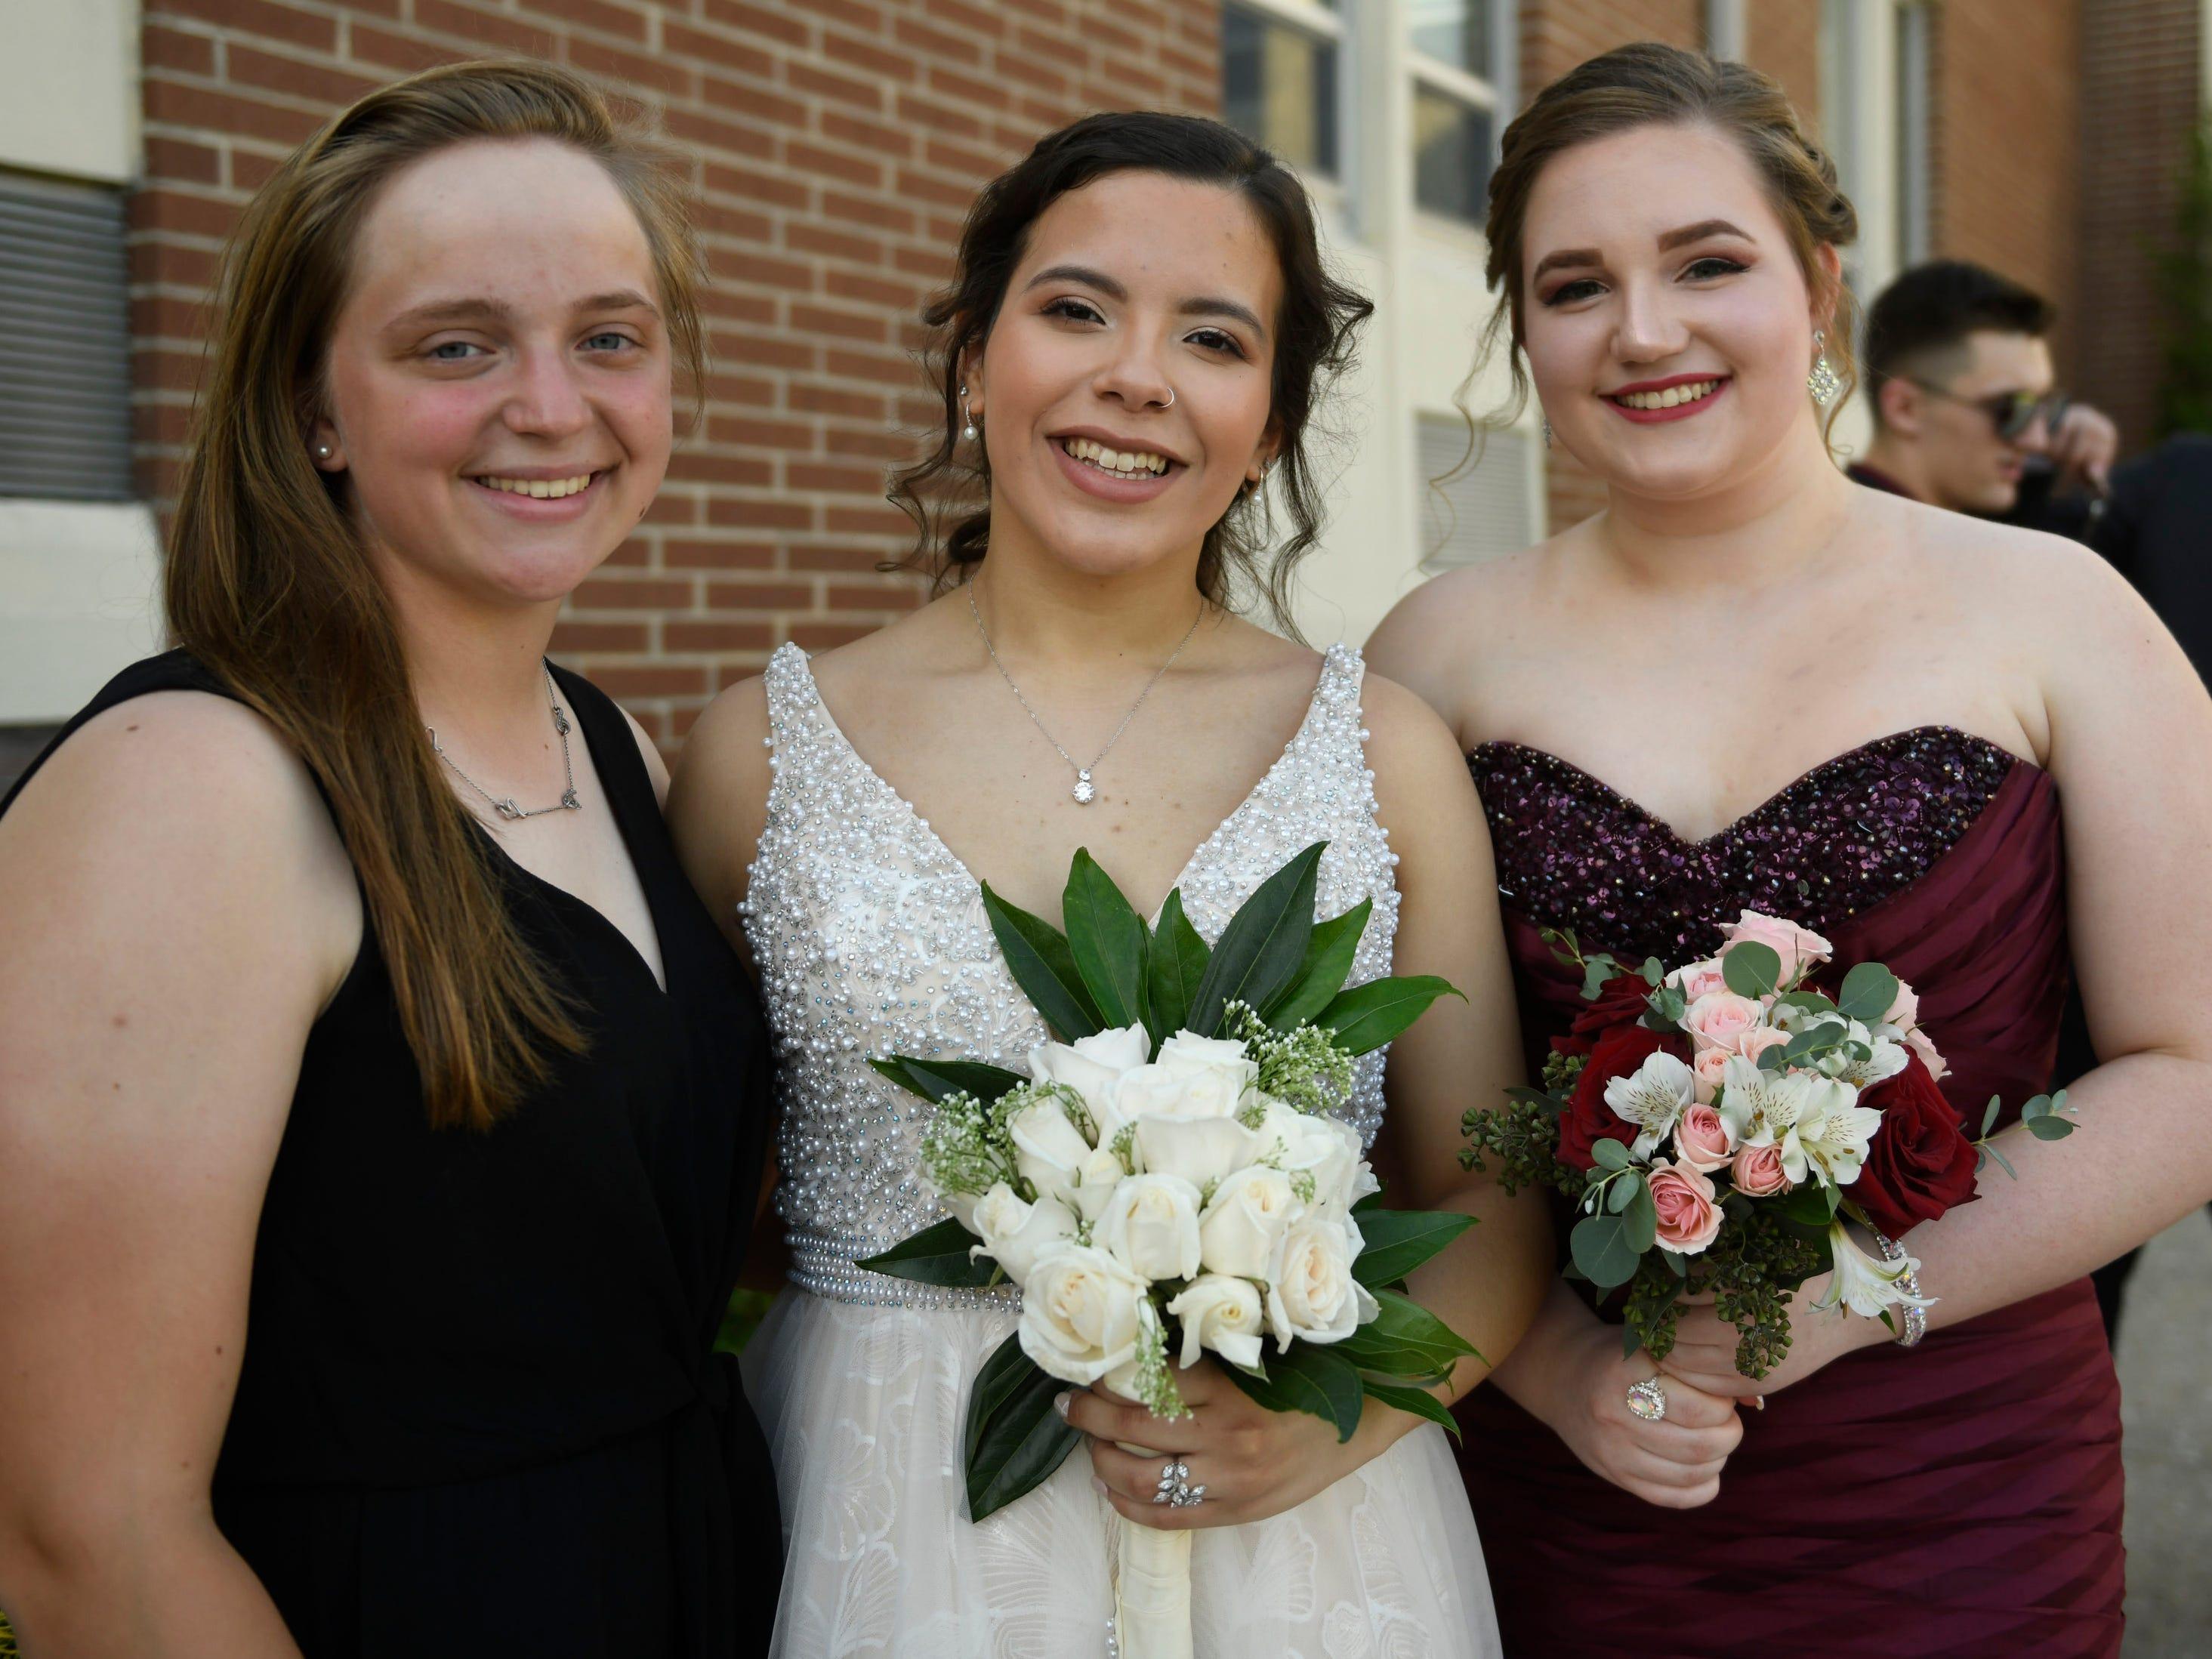 Buena Regional High School held it's pre-prom promenade in the school auditorium on Friday, May 3, 2019.